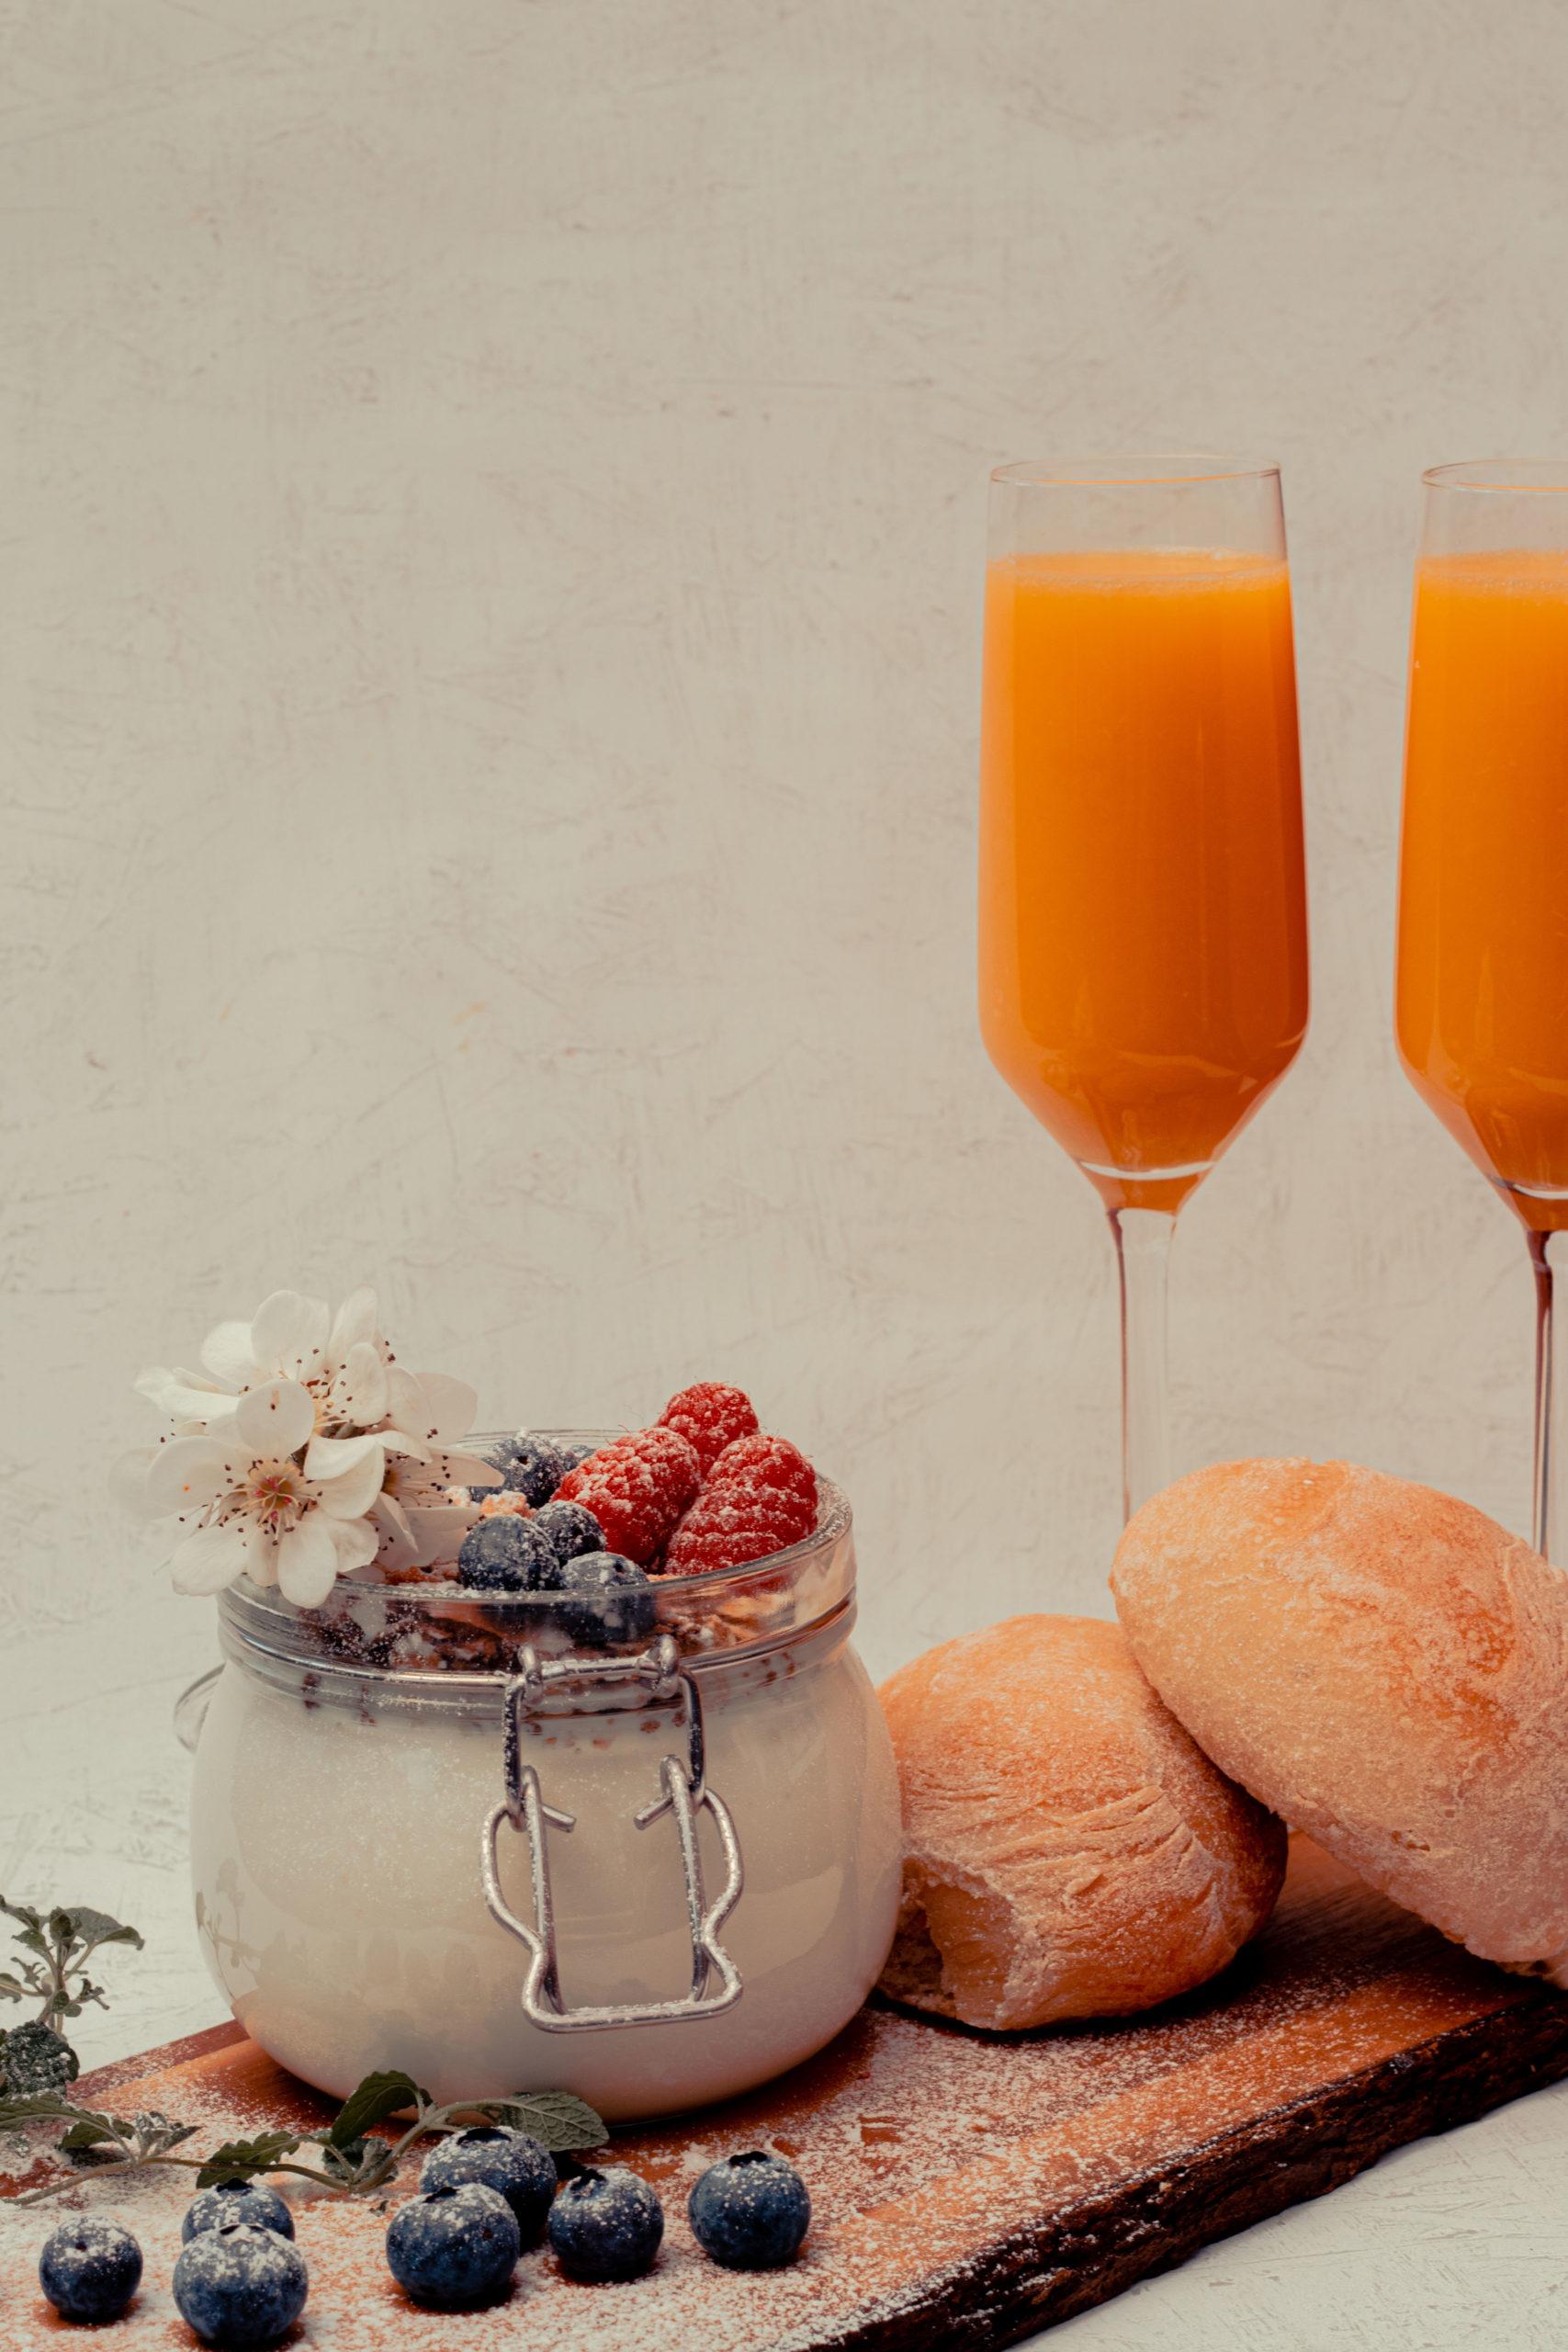 brunch, breakfast, orangejuice, buns, blueberrys, raspberrys, bowl with yoghurt and musli on a platter, mimosas